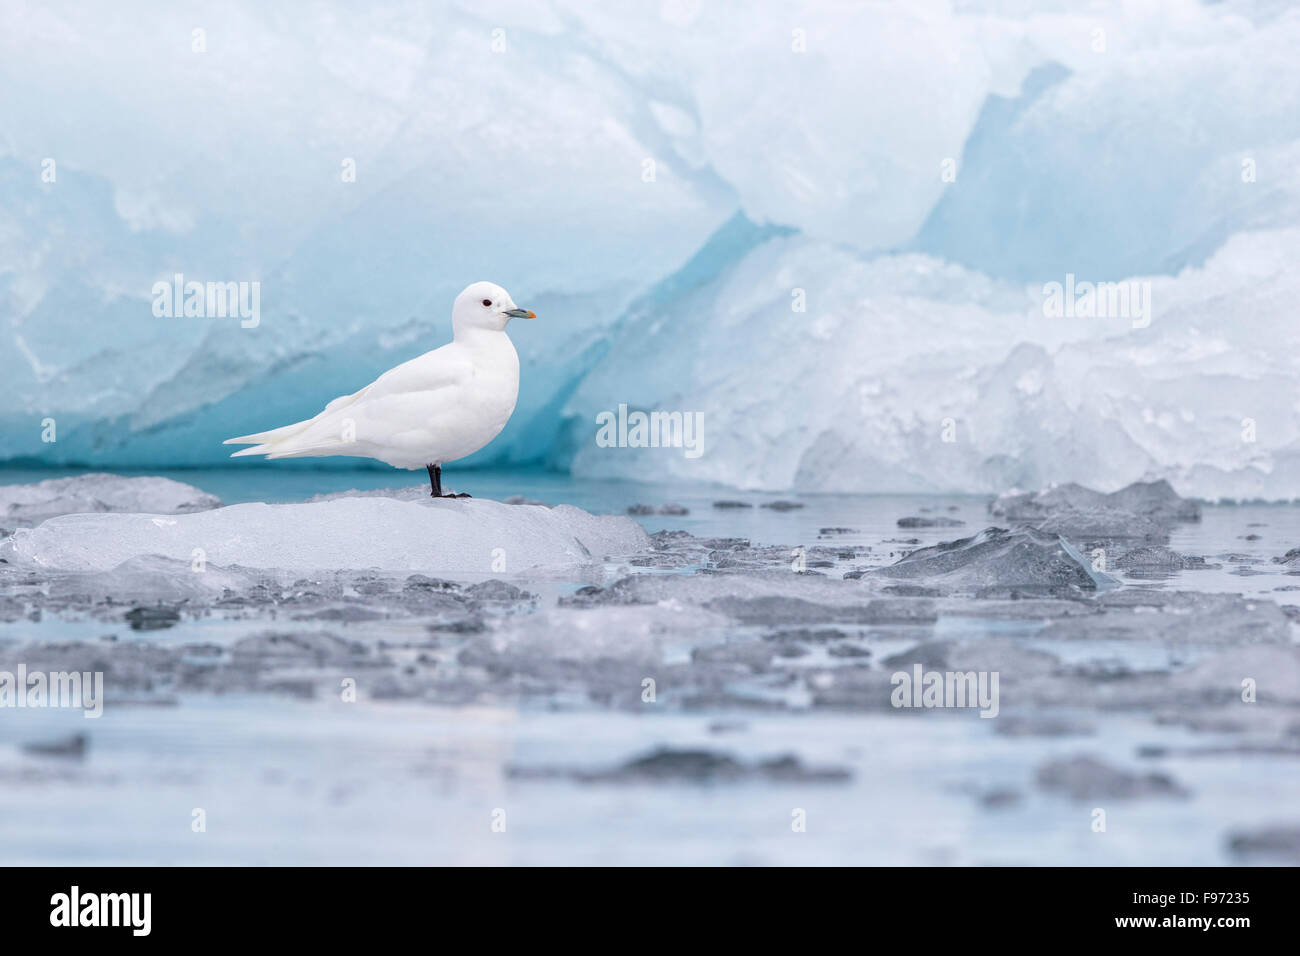 Ivory gull (Pagophila eburnea), adult on ice at glacier front, Samarinvagen Bay, Hornsund  Fjord, Svalbard Archipelago, - Stock Image